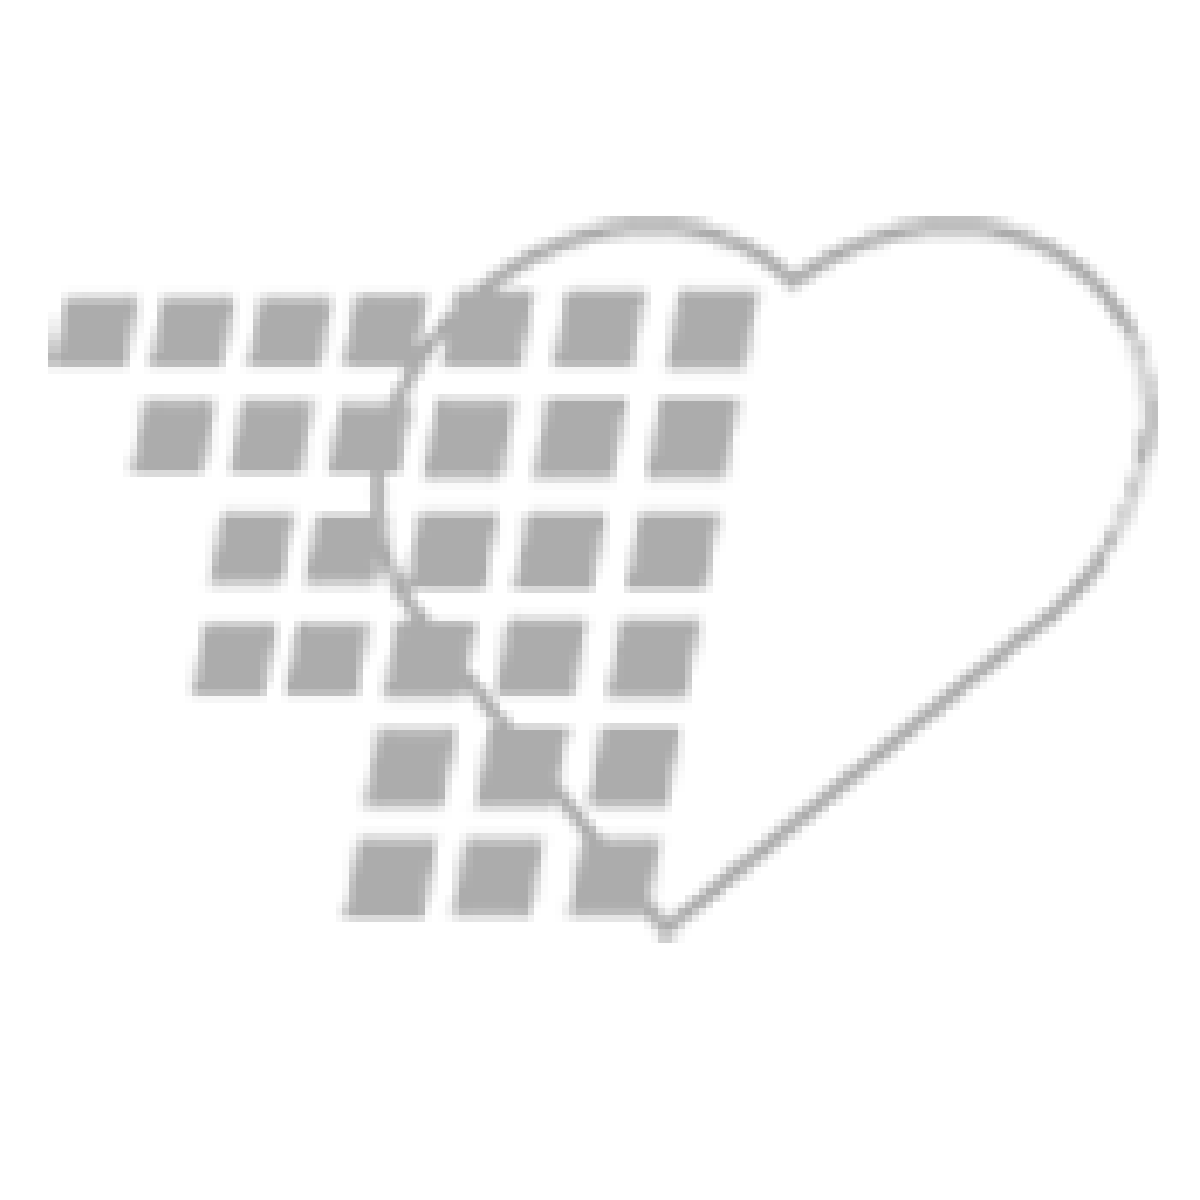 09-31-8952 Vascular System and Viscera Chart